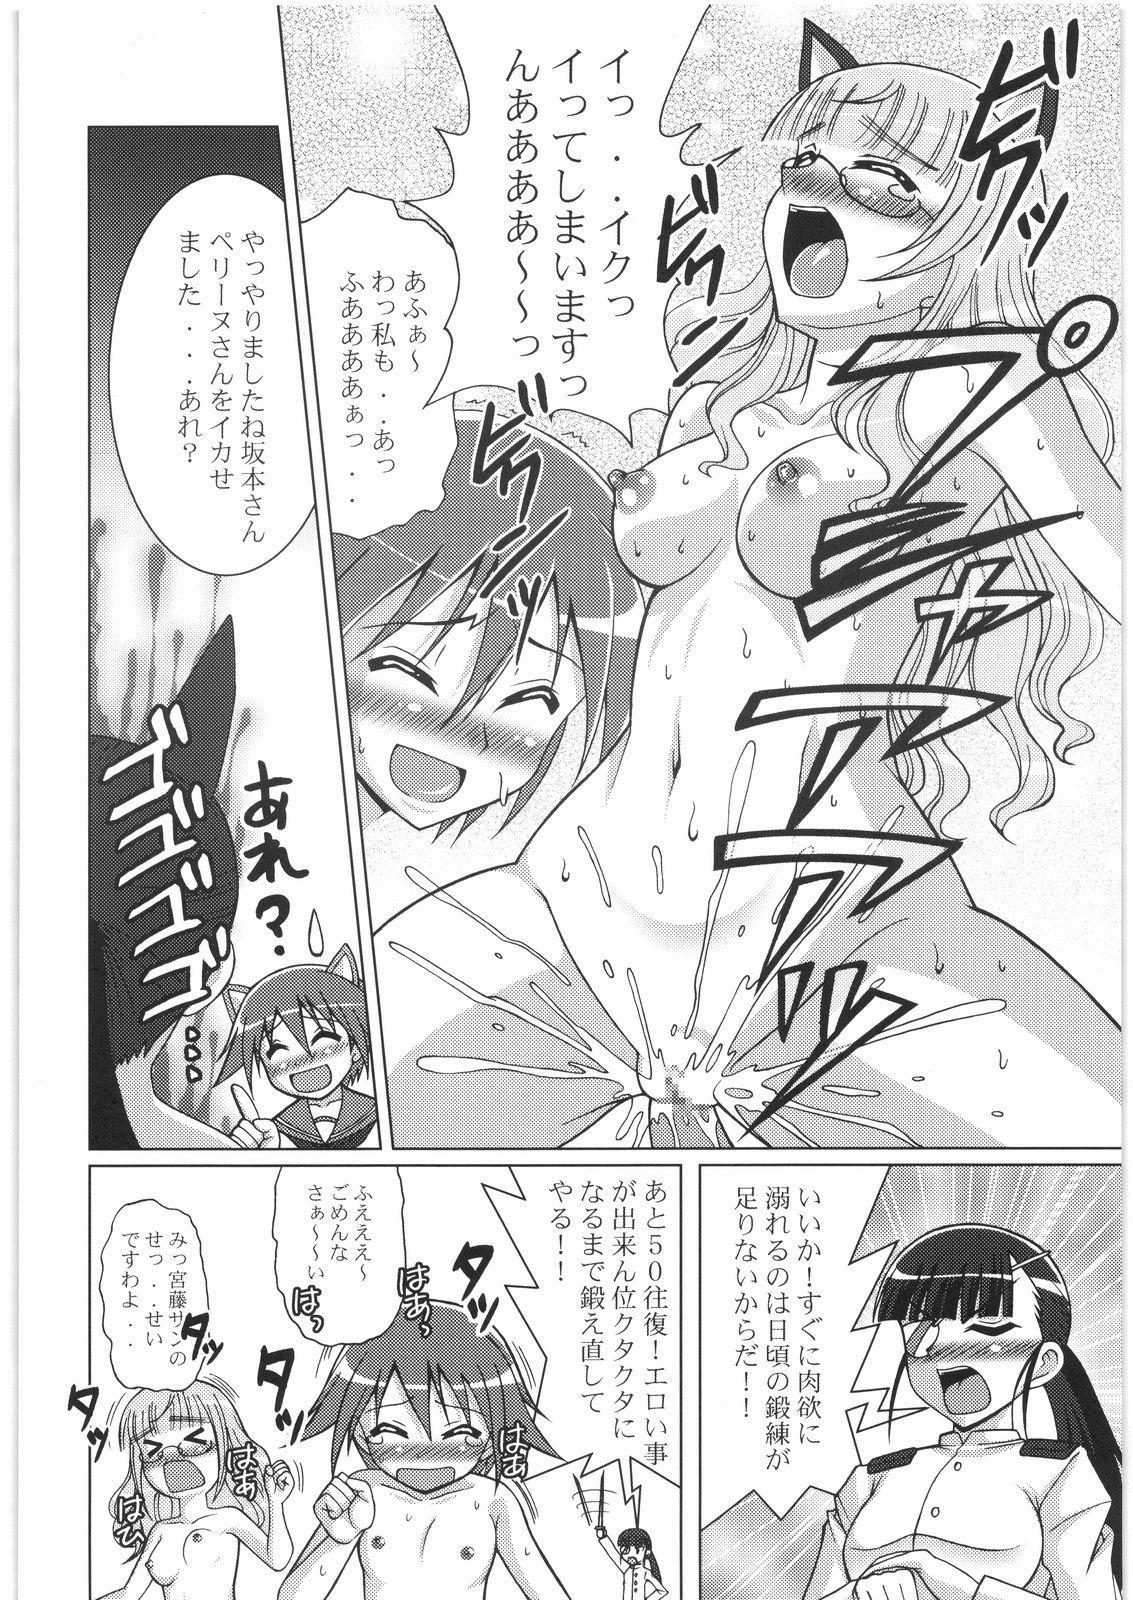 Strike Kyoukan 36